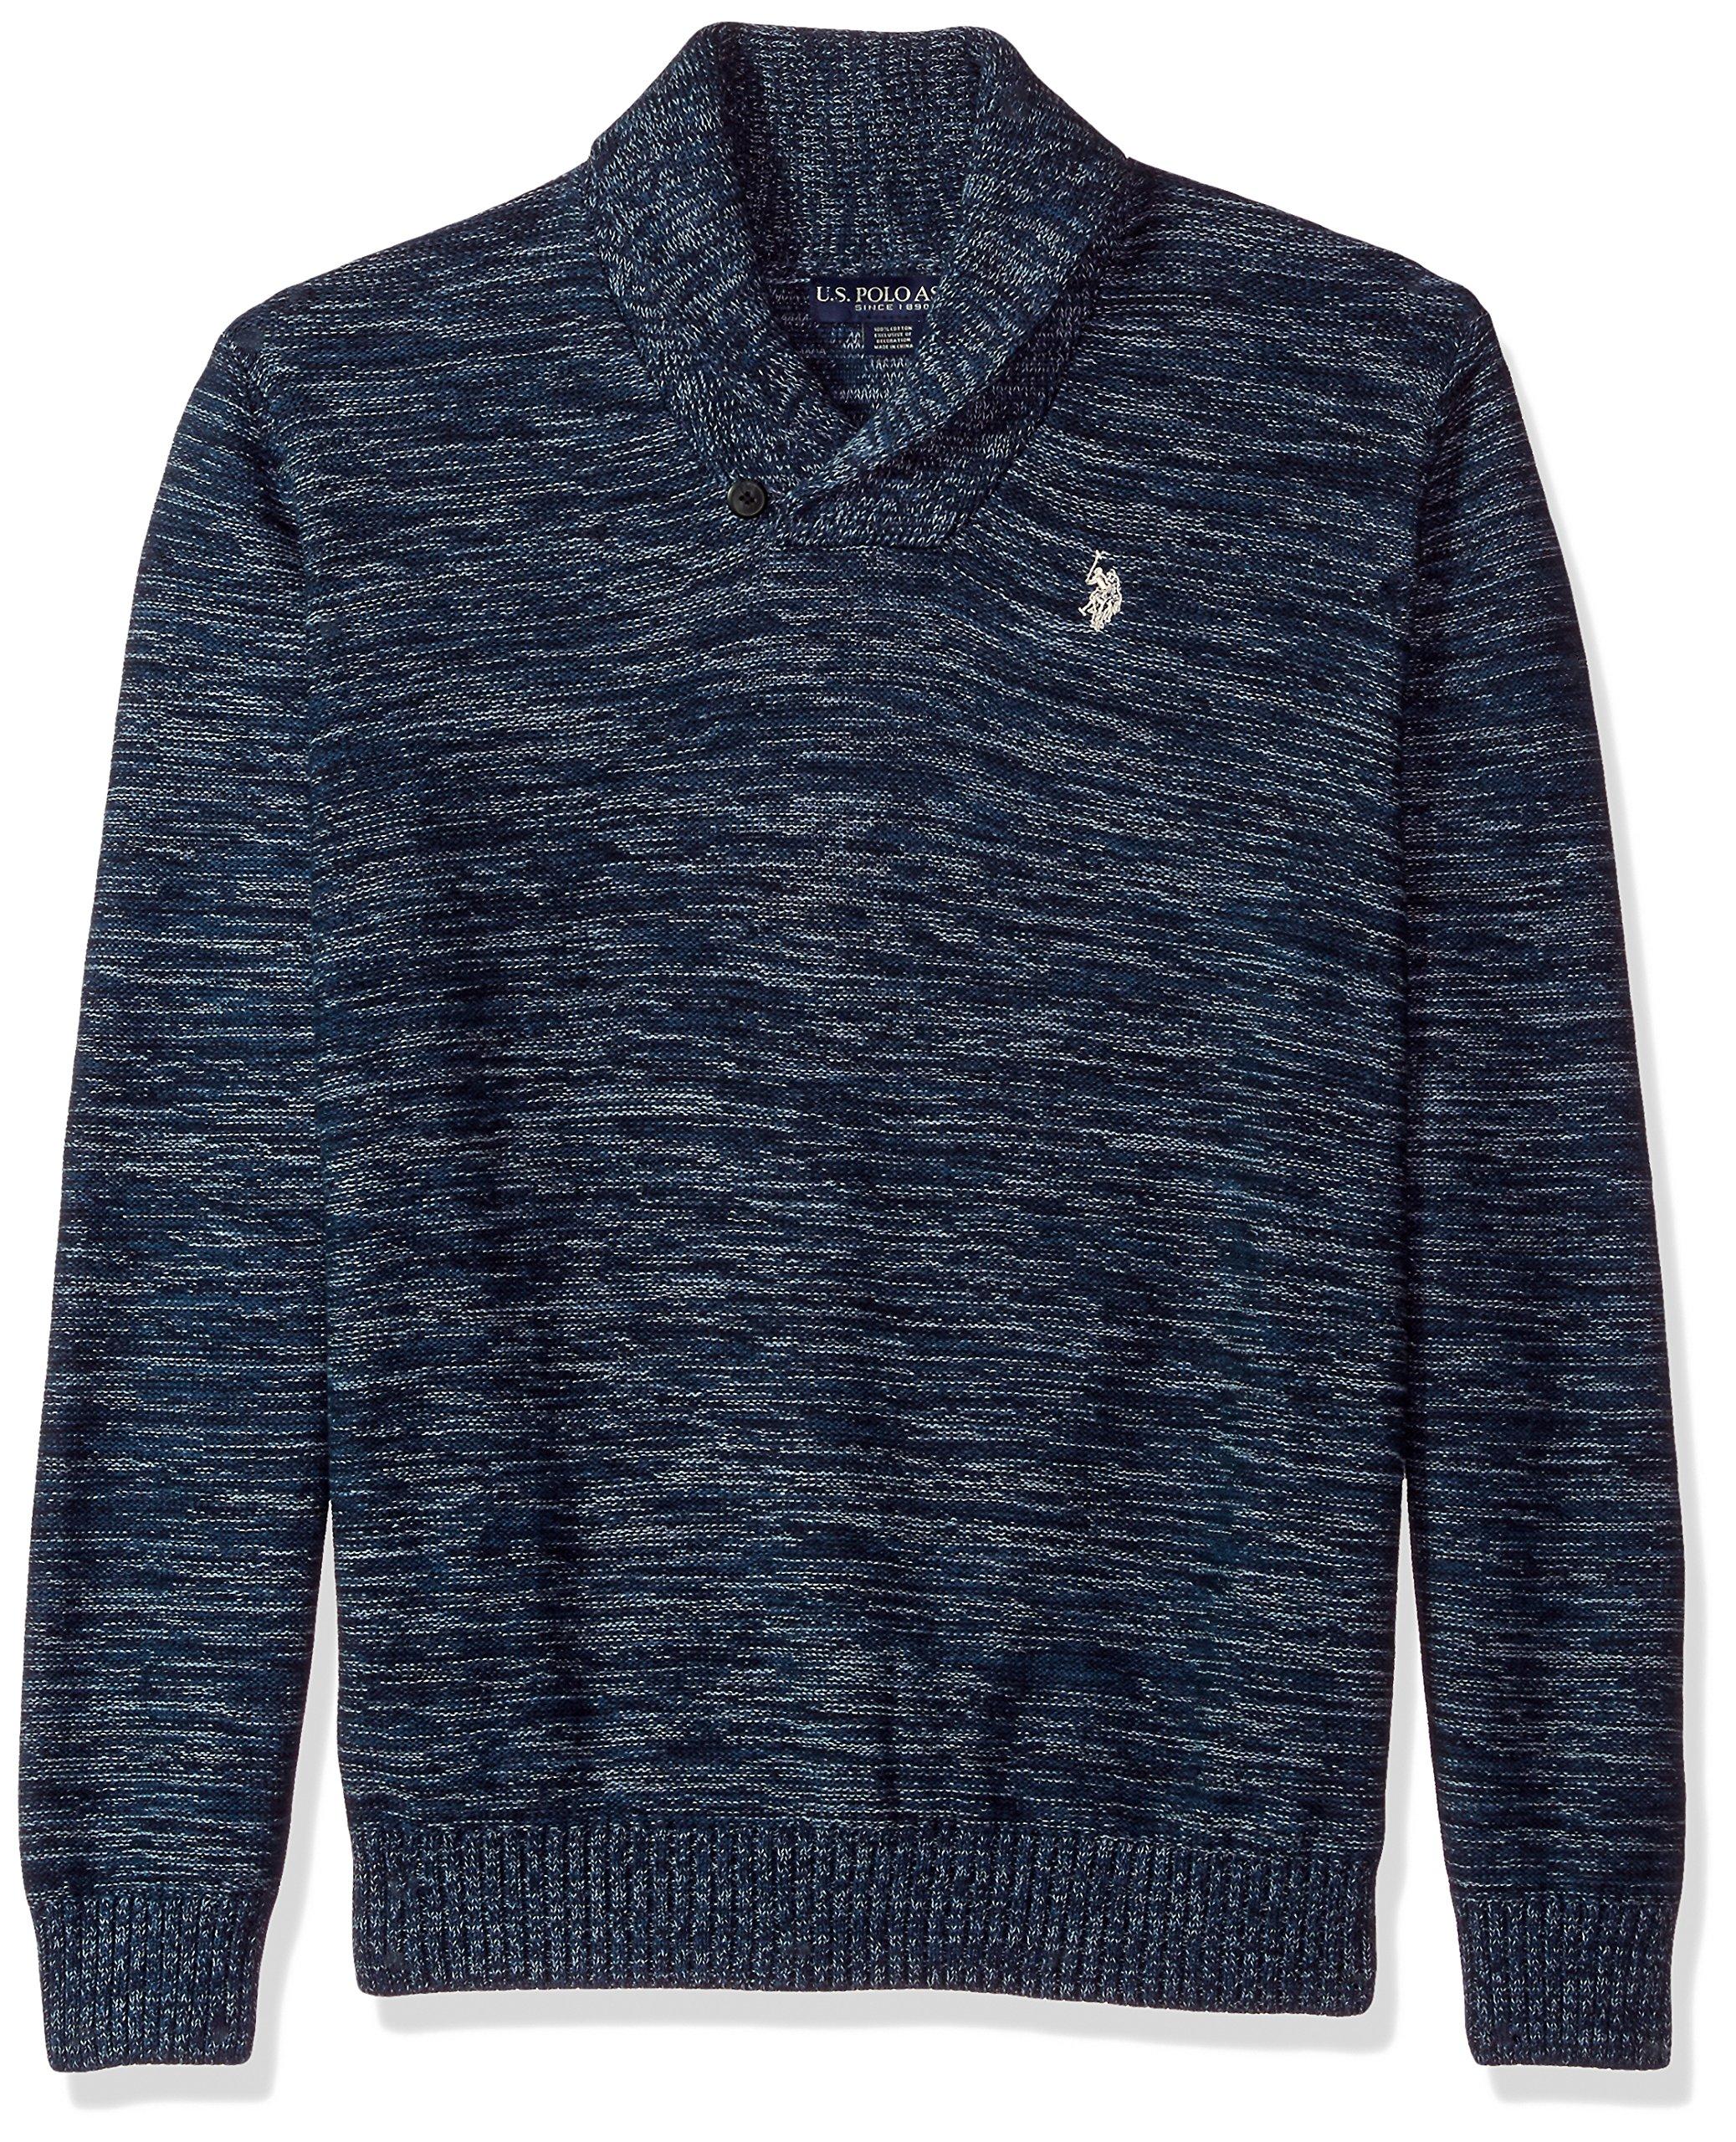 U.S. Polo Assn. Men's Reverse Jersey Shawl Collar Sweater, Sailor MARL, Large